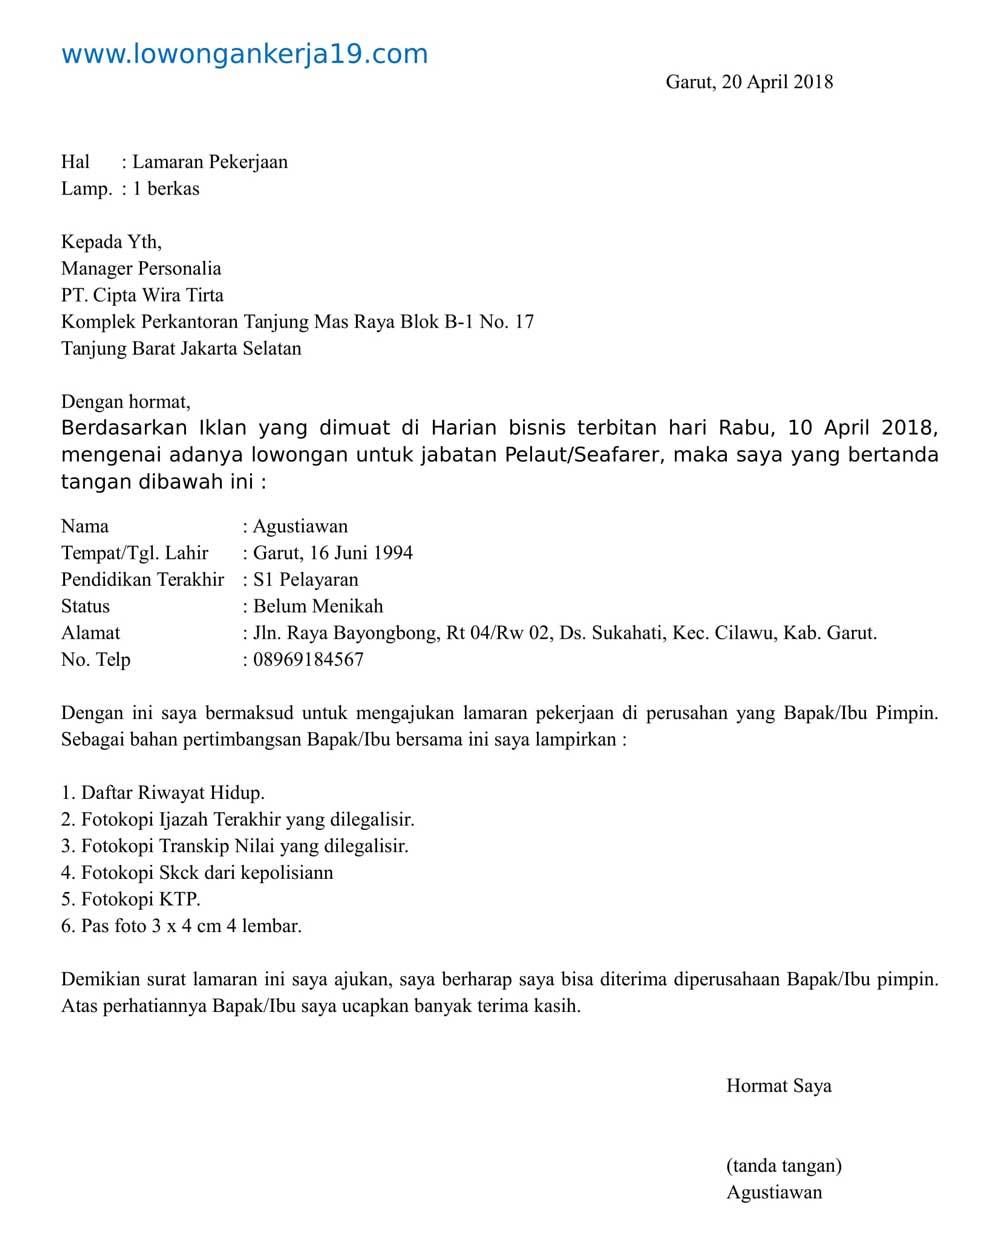 Contoh Surat Lamaran Kerja Bahasa Indonesia Yang Baik Dan Benar Id